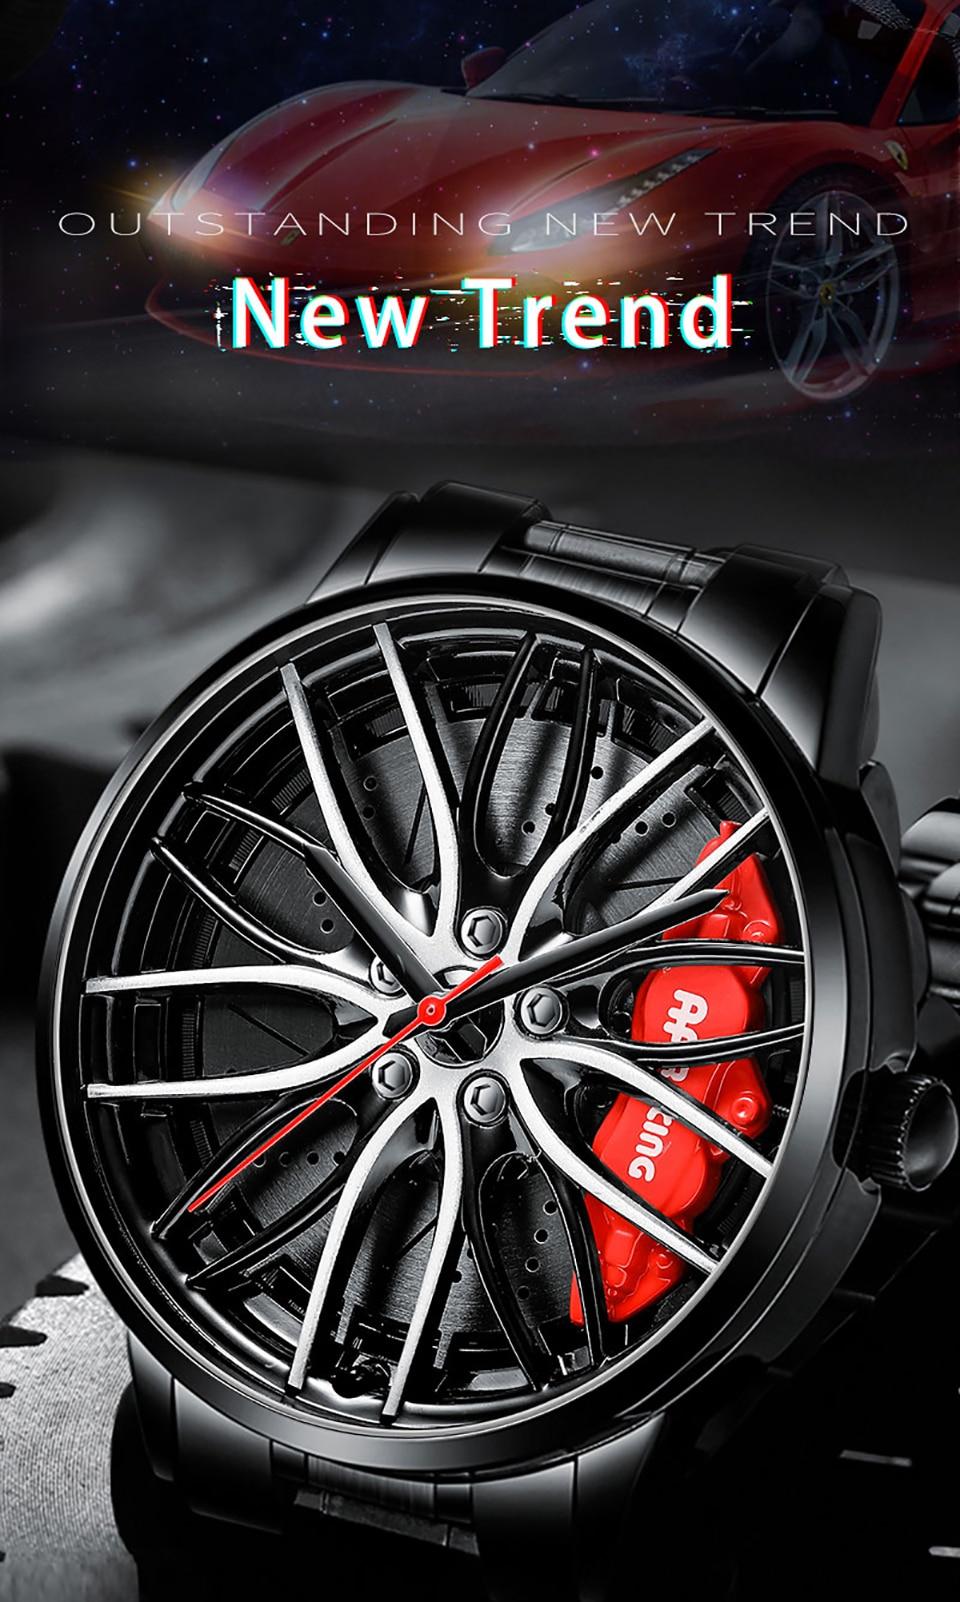 H187e23579625476ebcd43f1c4e0f0e891 NEKTOM Sports Car Wheel Rim Hub Watches Men Custom Design Sport Car